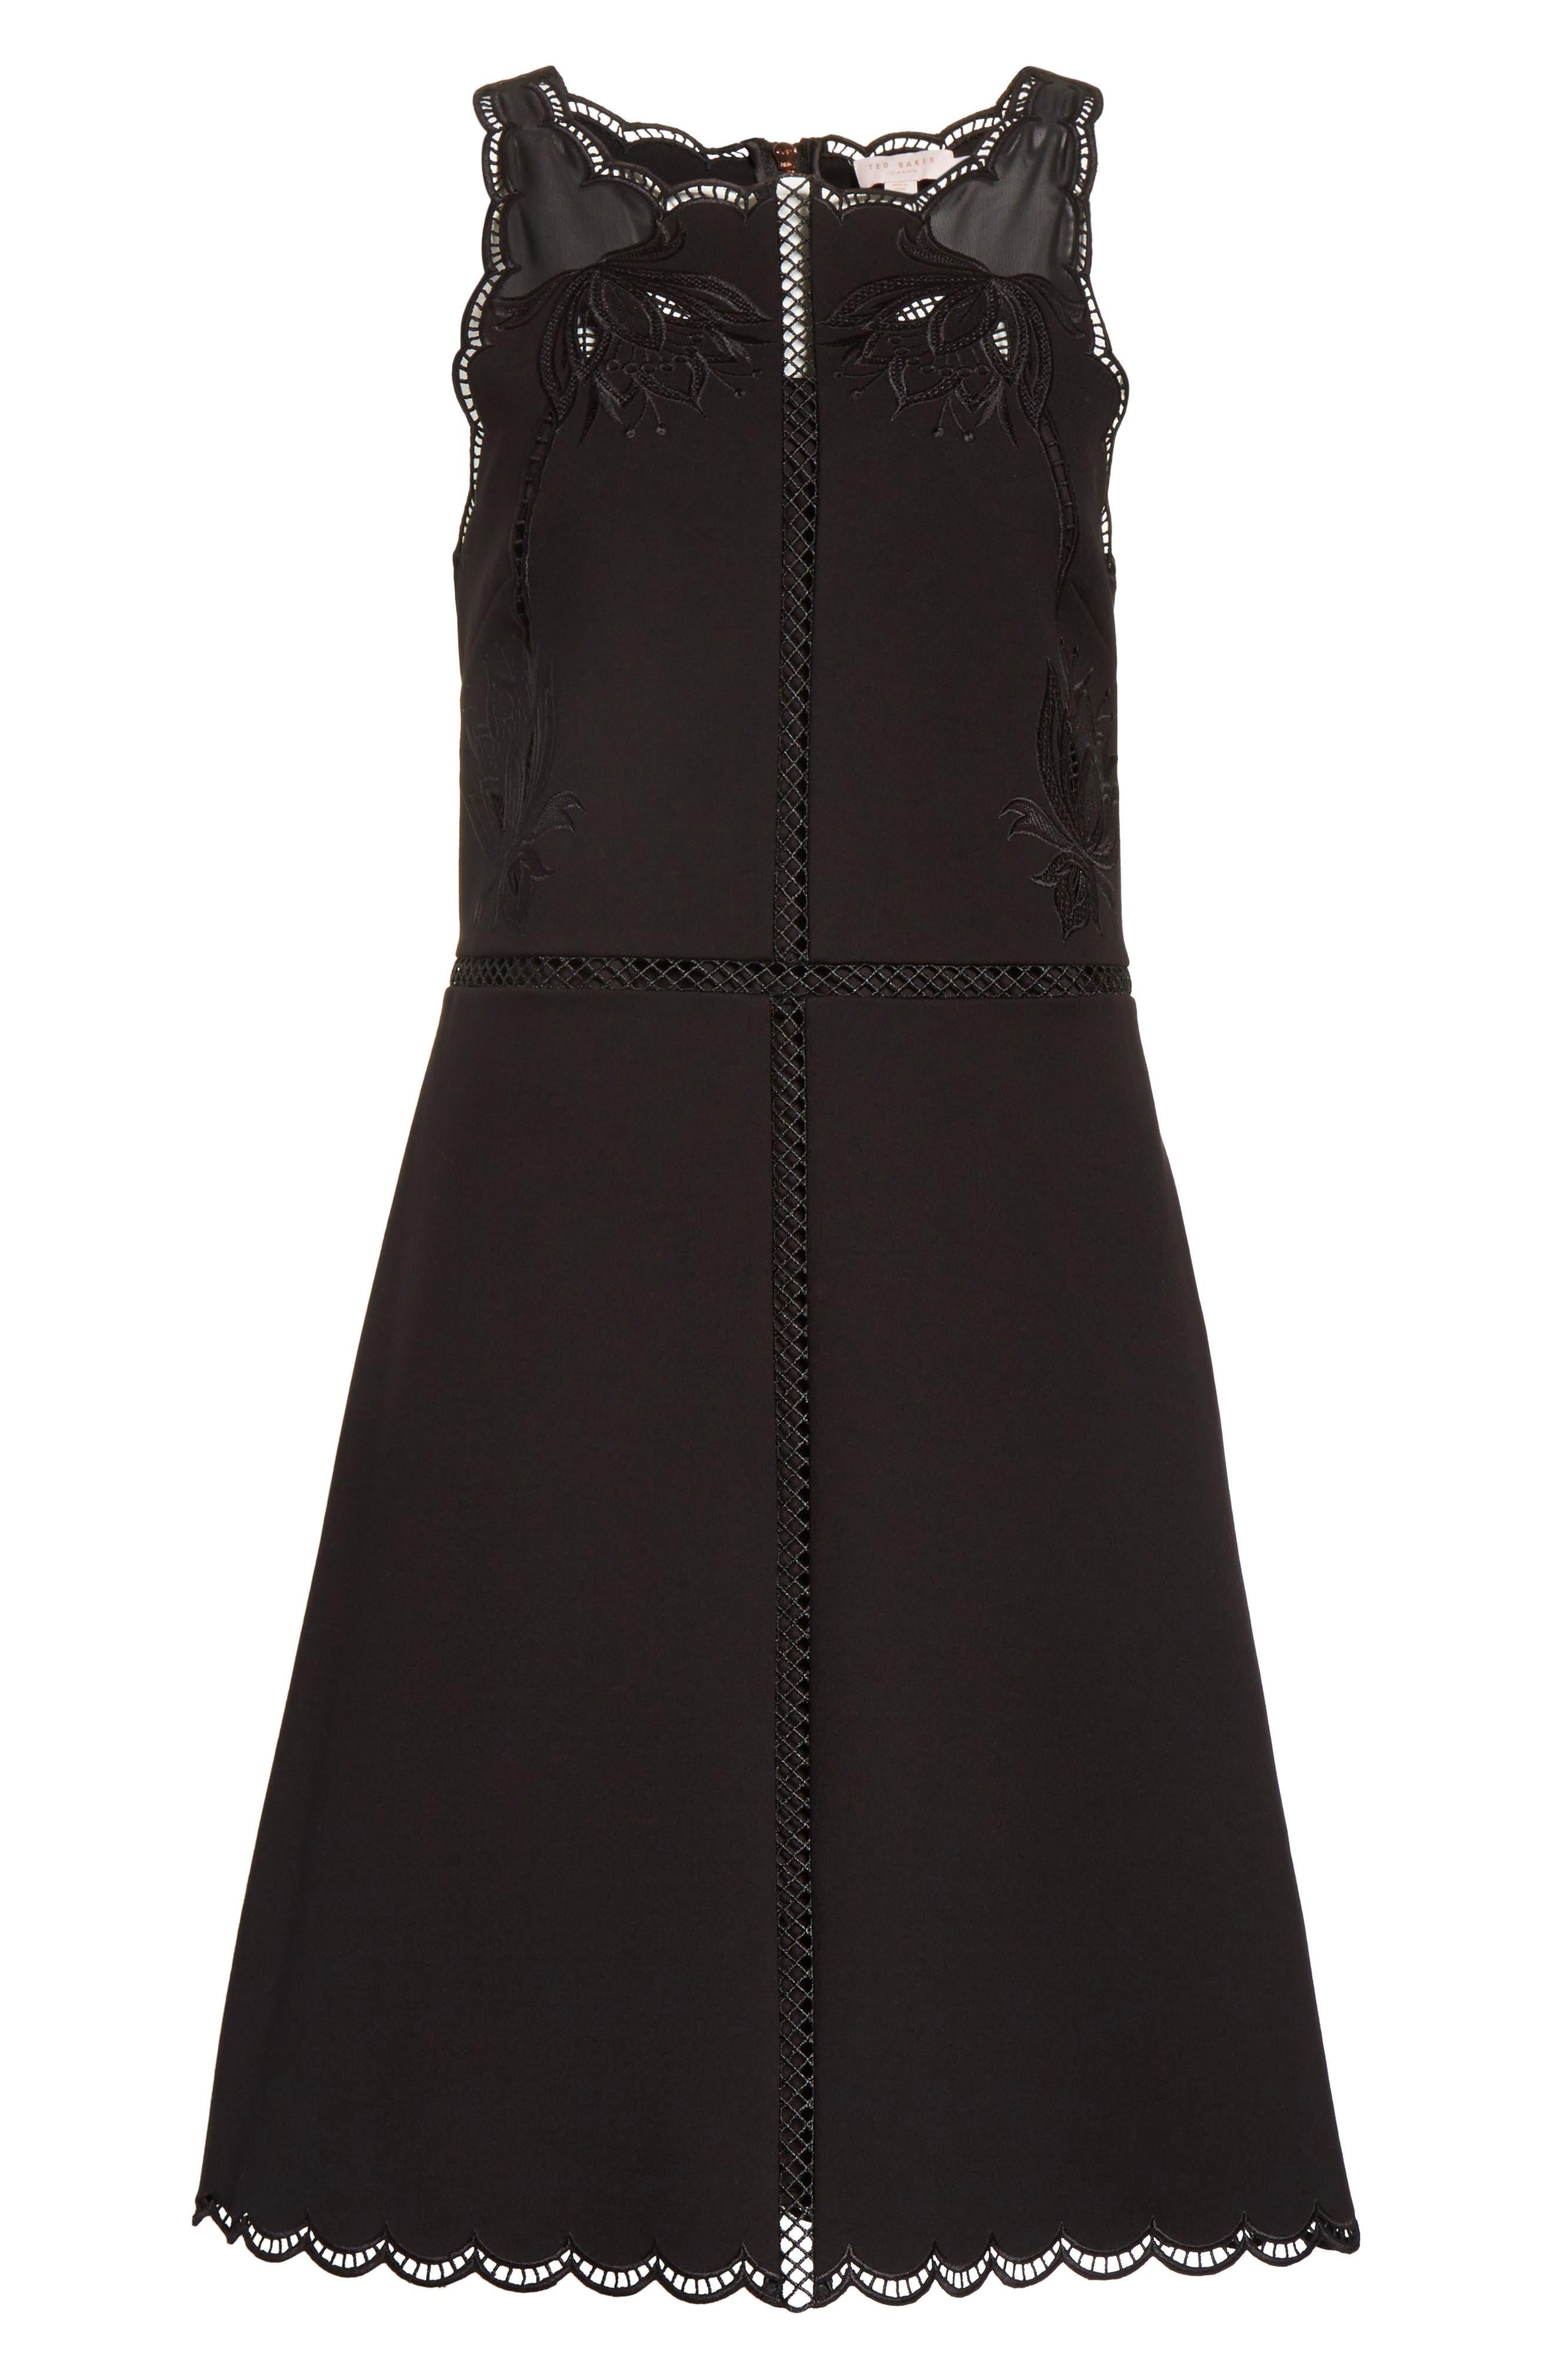 Codi Embroidered Scallop A-Line Dress,                             Alternate thumbnail 6, color,                             001